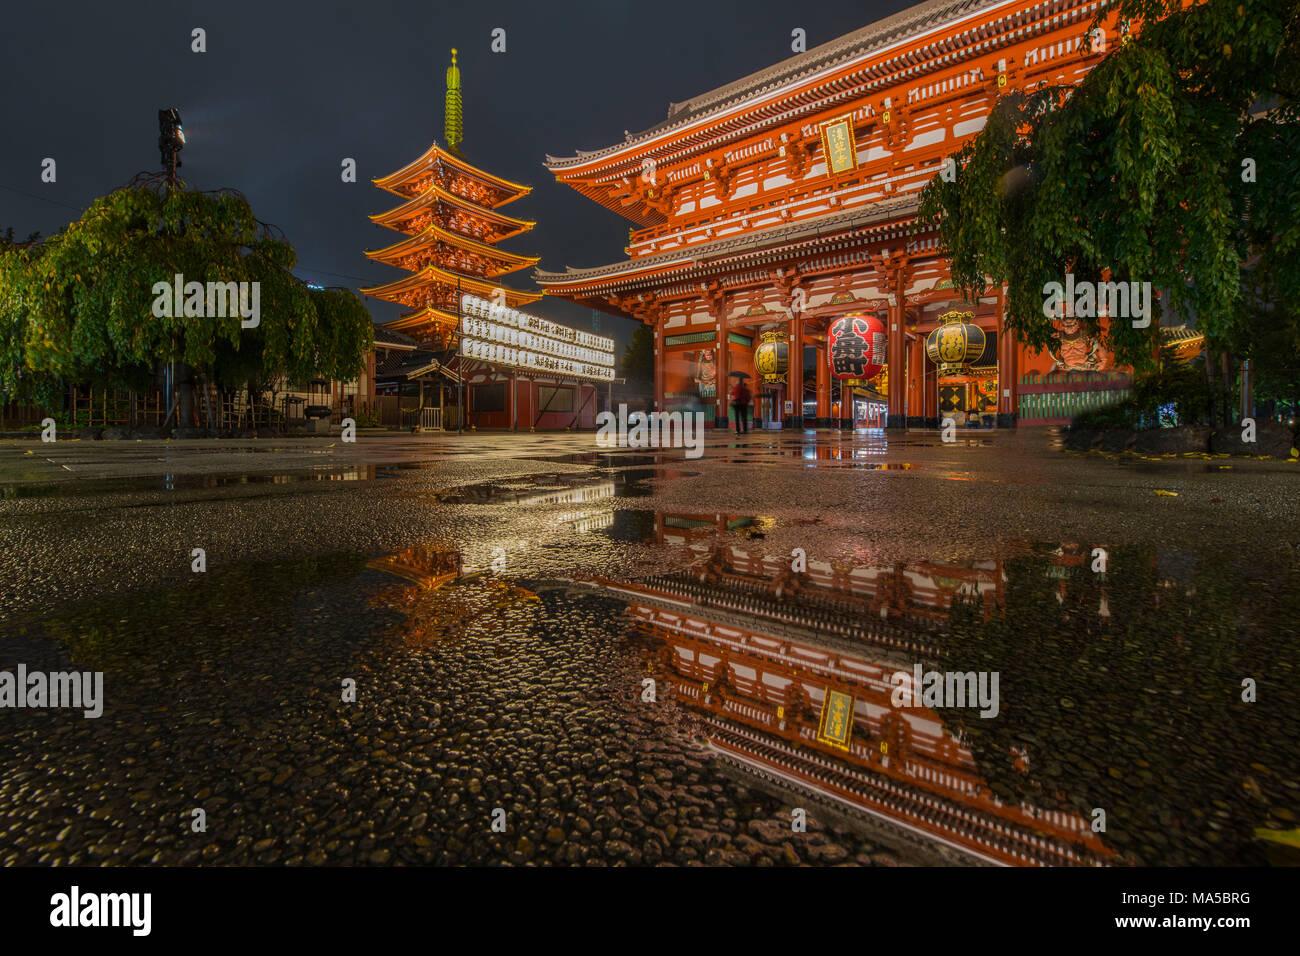 Asien, Japan, Nihon, Nippon, Tokio, Taito, Asakusa, Sens?-ji-Tempel Komplex mit Pagode Stockbild